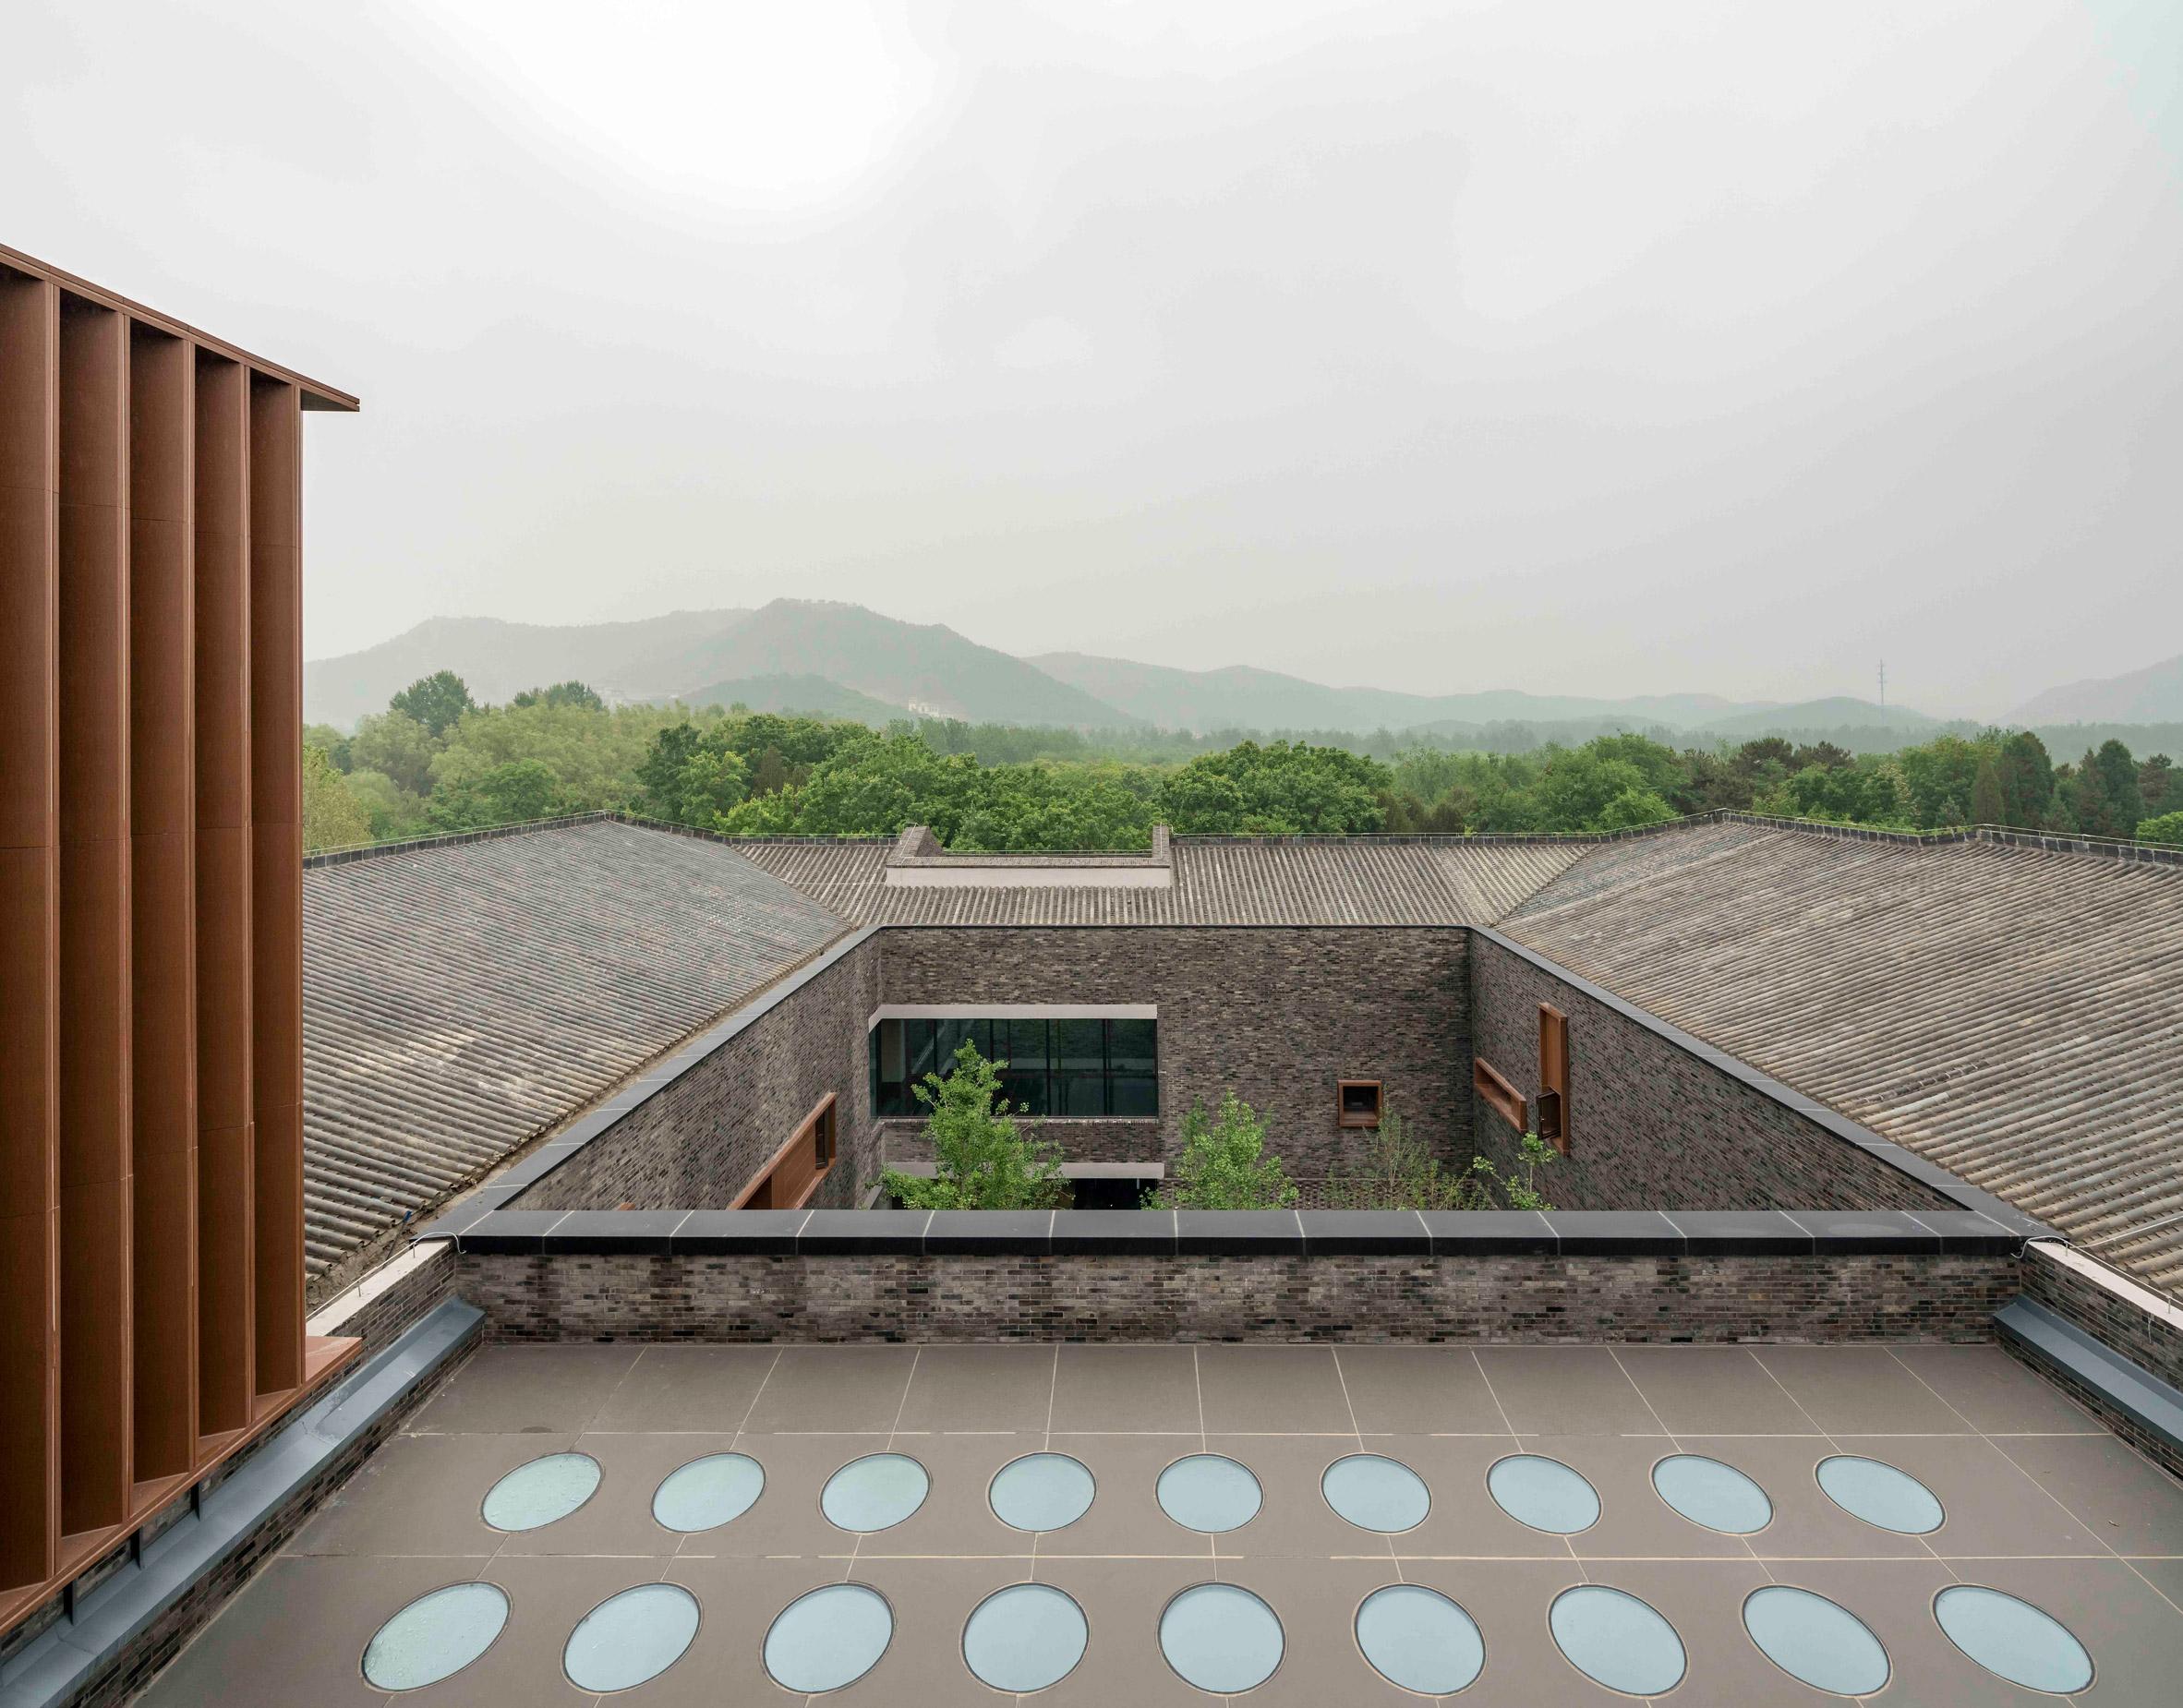 Junshan Cultural Center by Neri&Hu